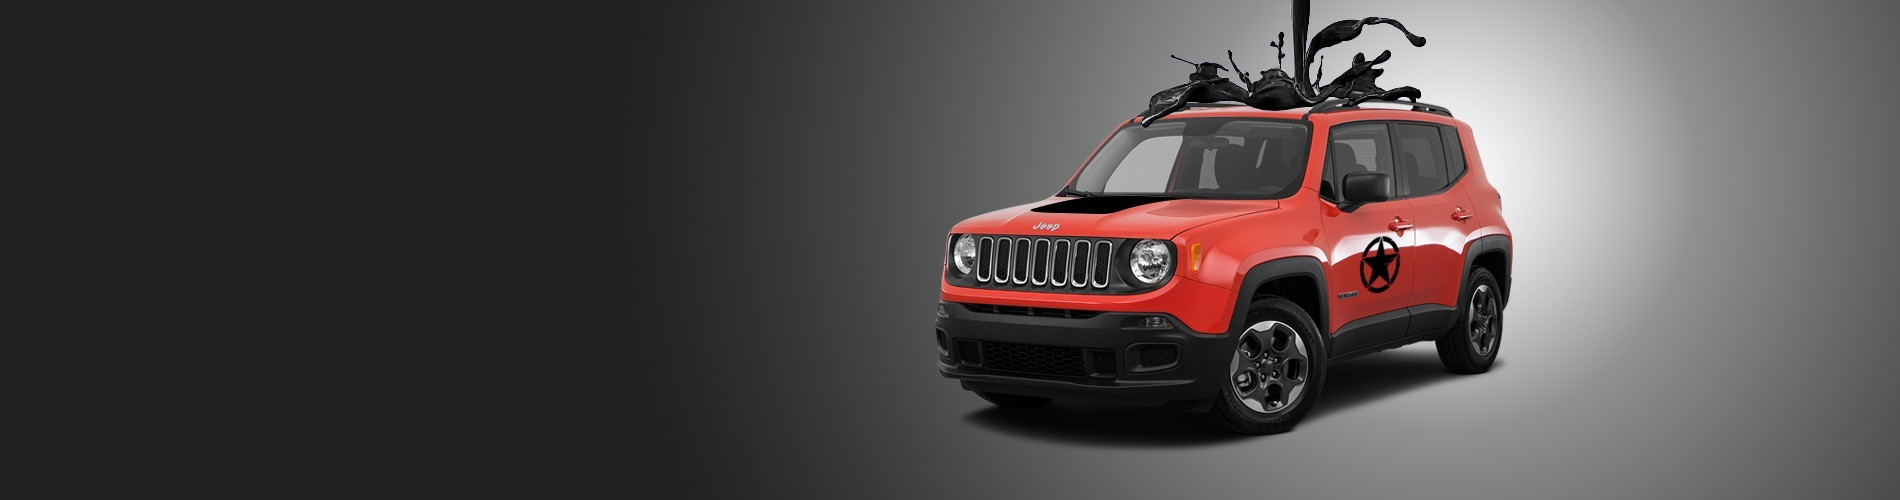 My Beautiful Car - Jeep Renegade Decals